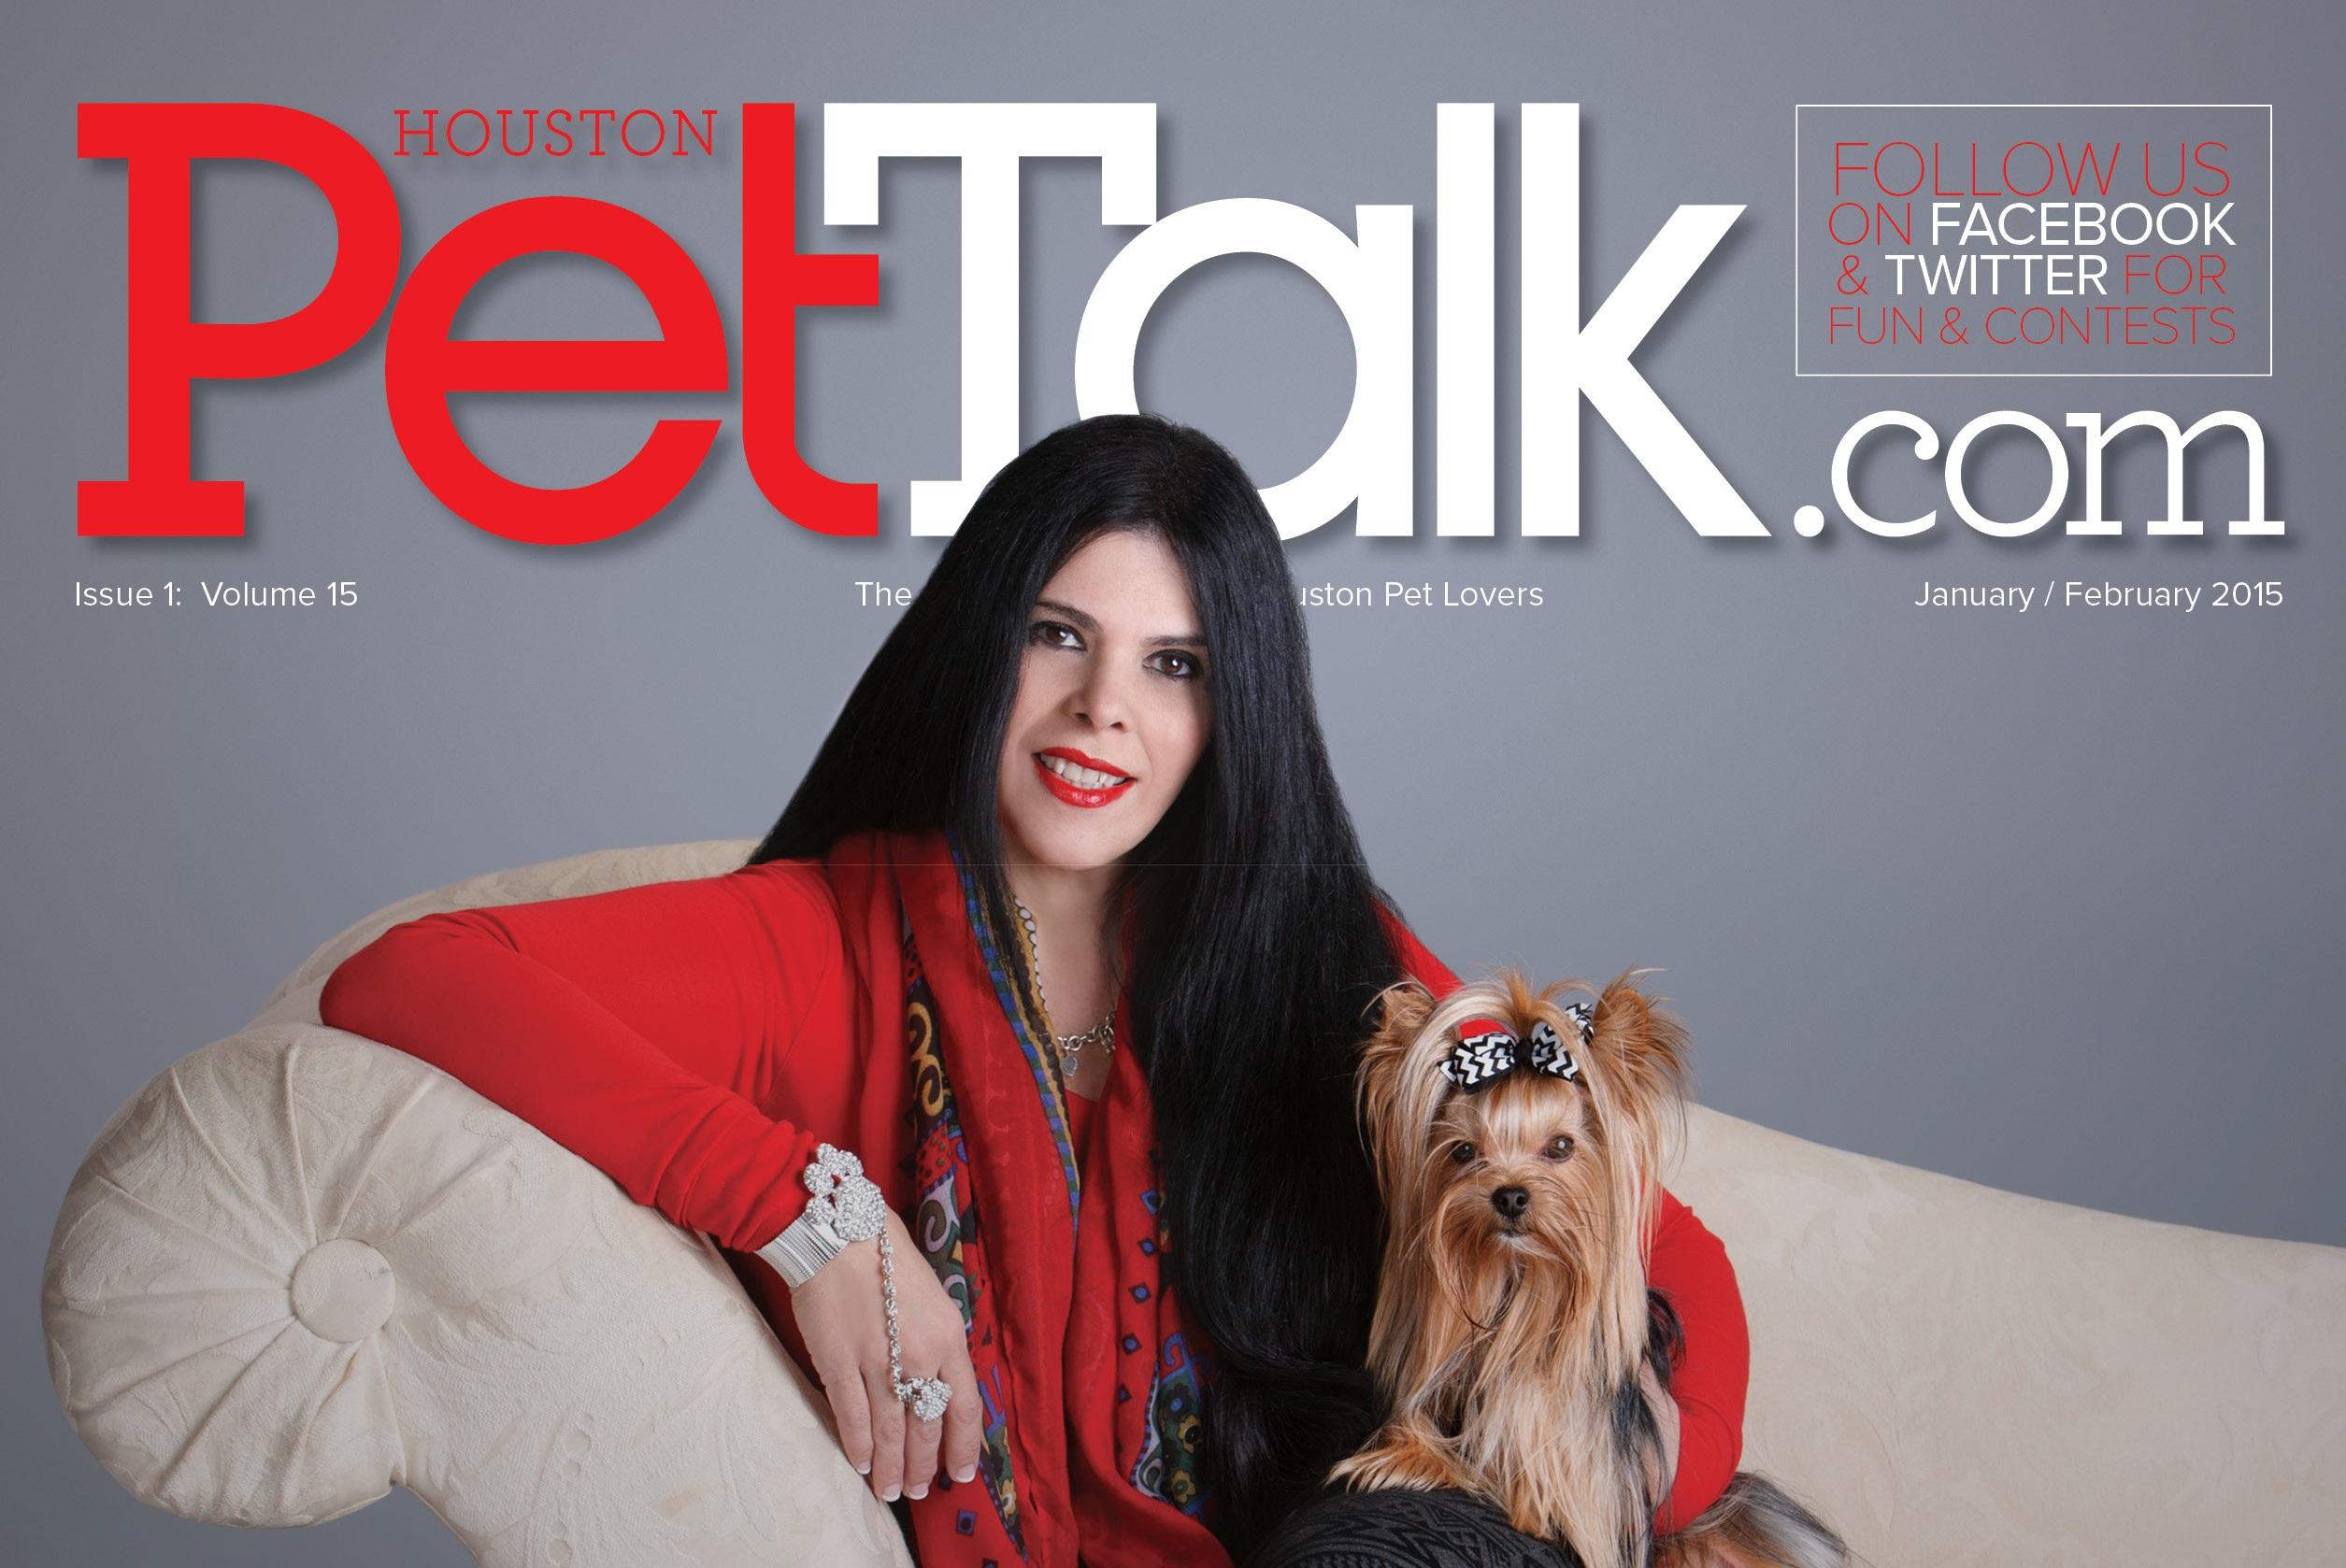 January & February 2015 Digital Issue of Houston PetTalk